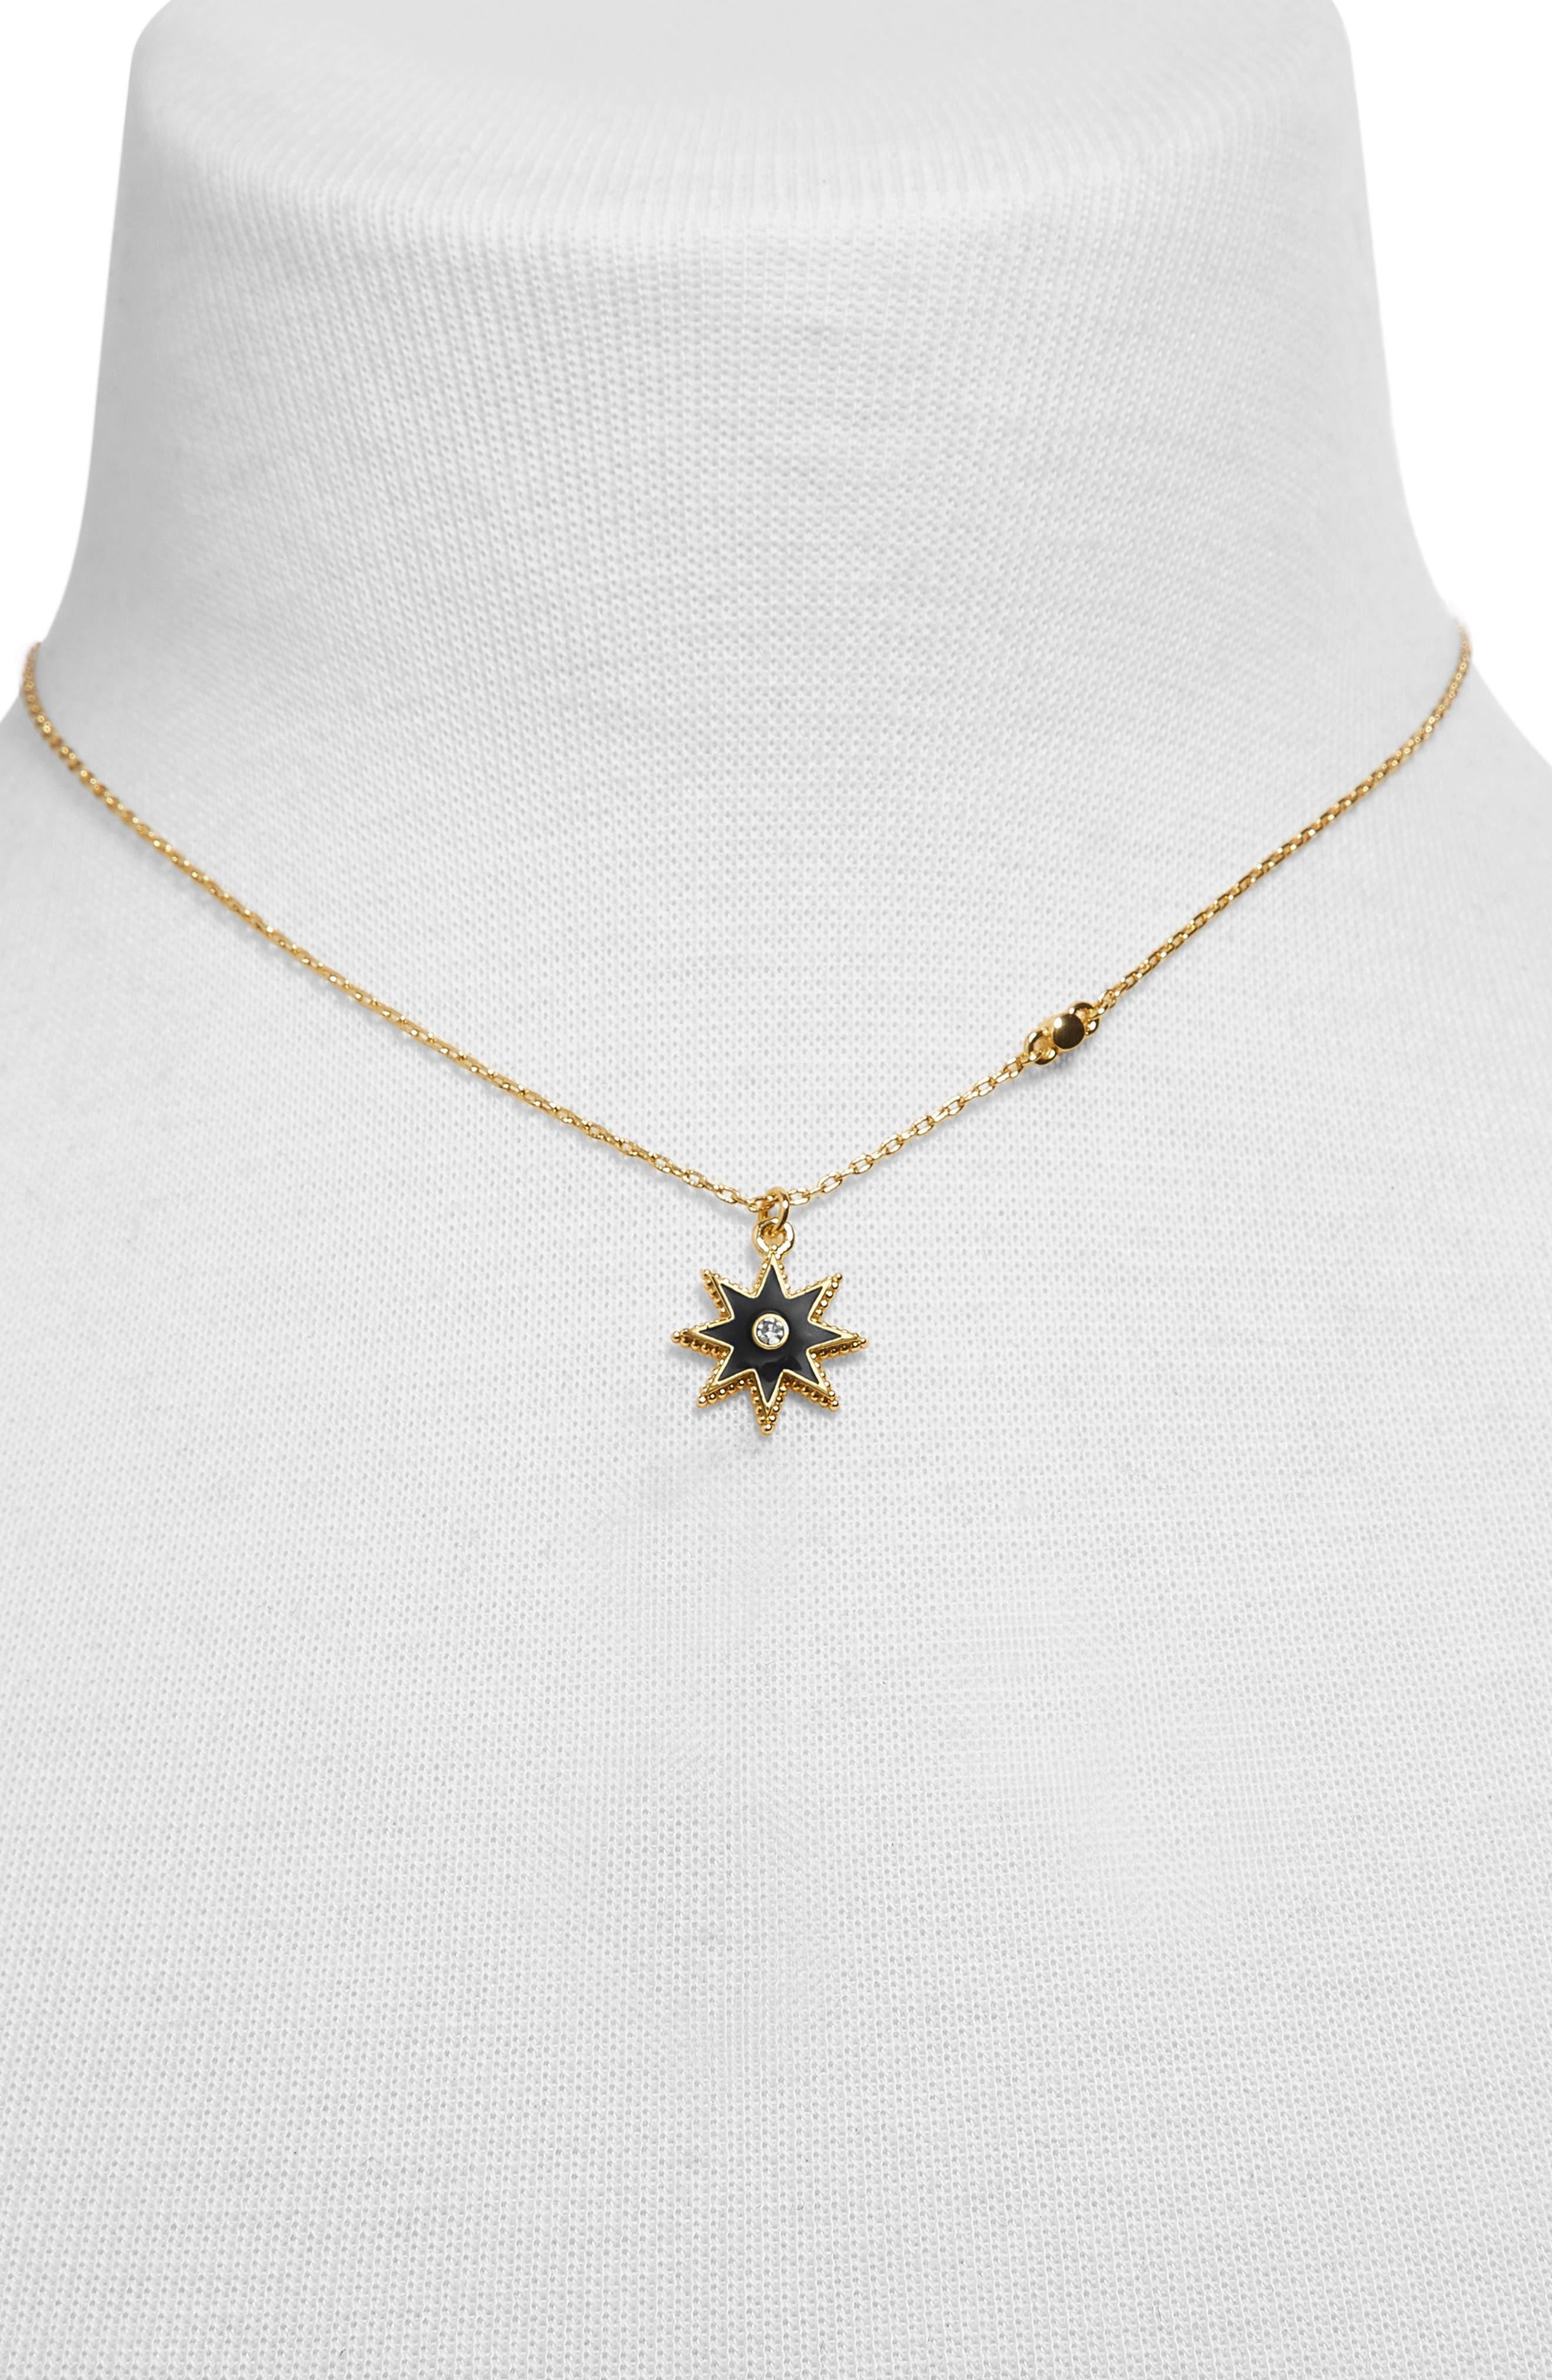 Merralina Star Pendant Necklace,                             Alternate thumbnail 2, color,                             GOLD/ BLACK